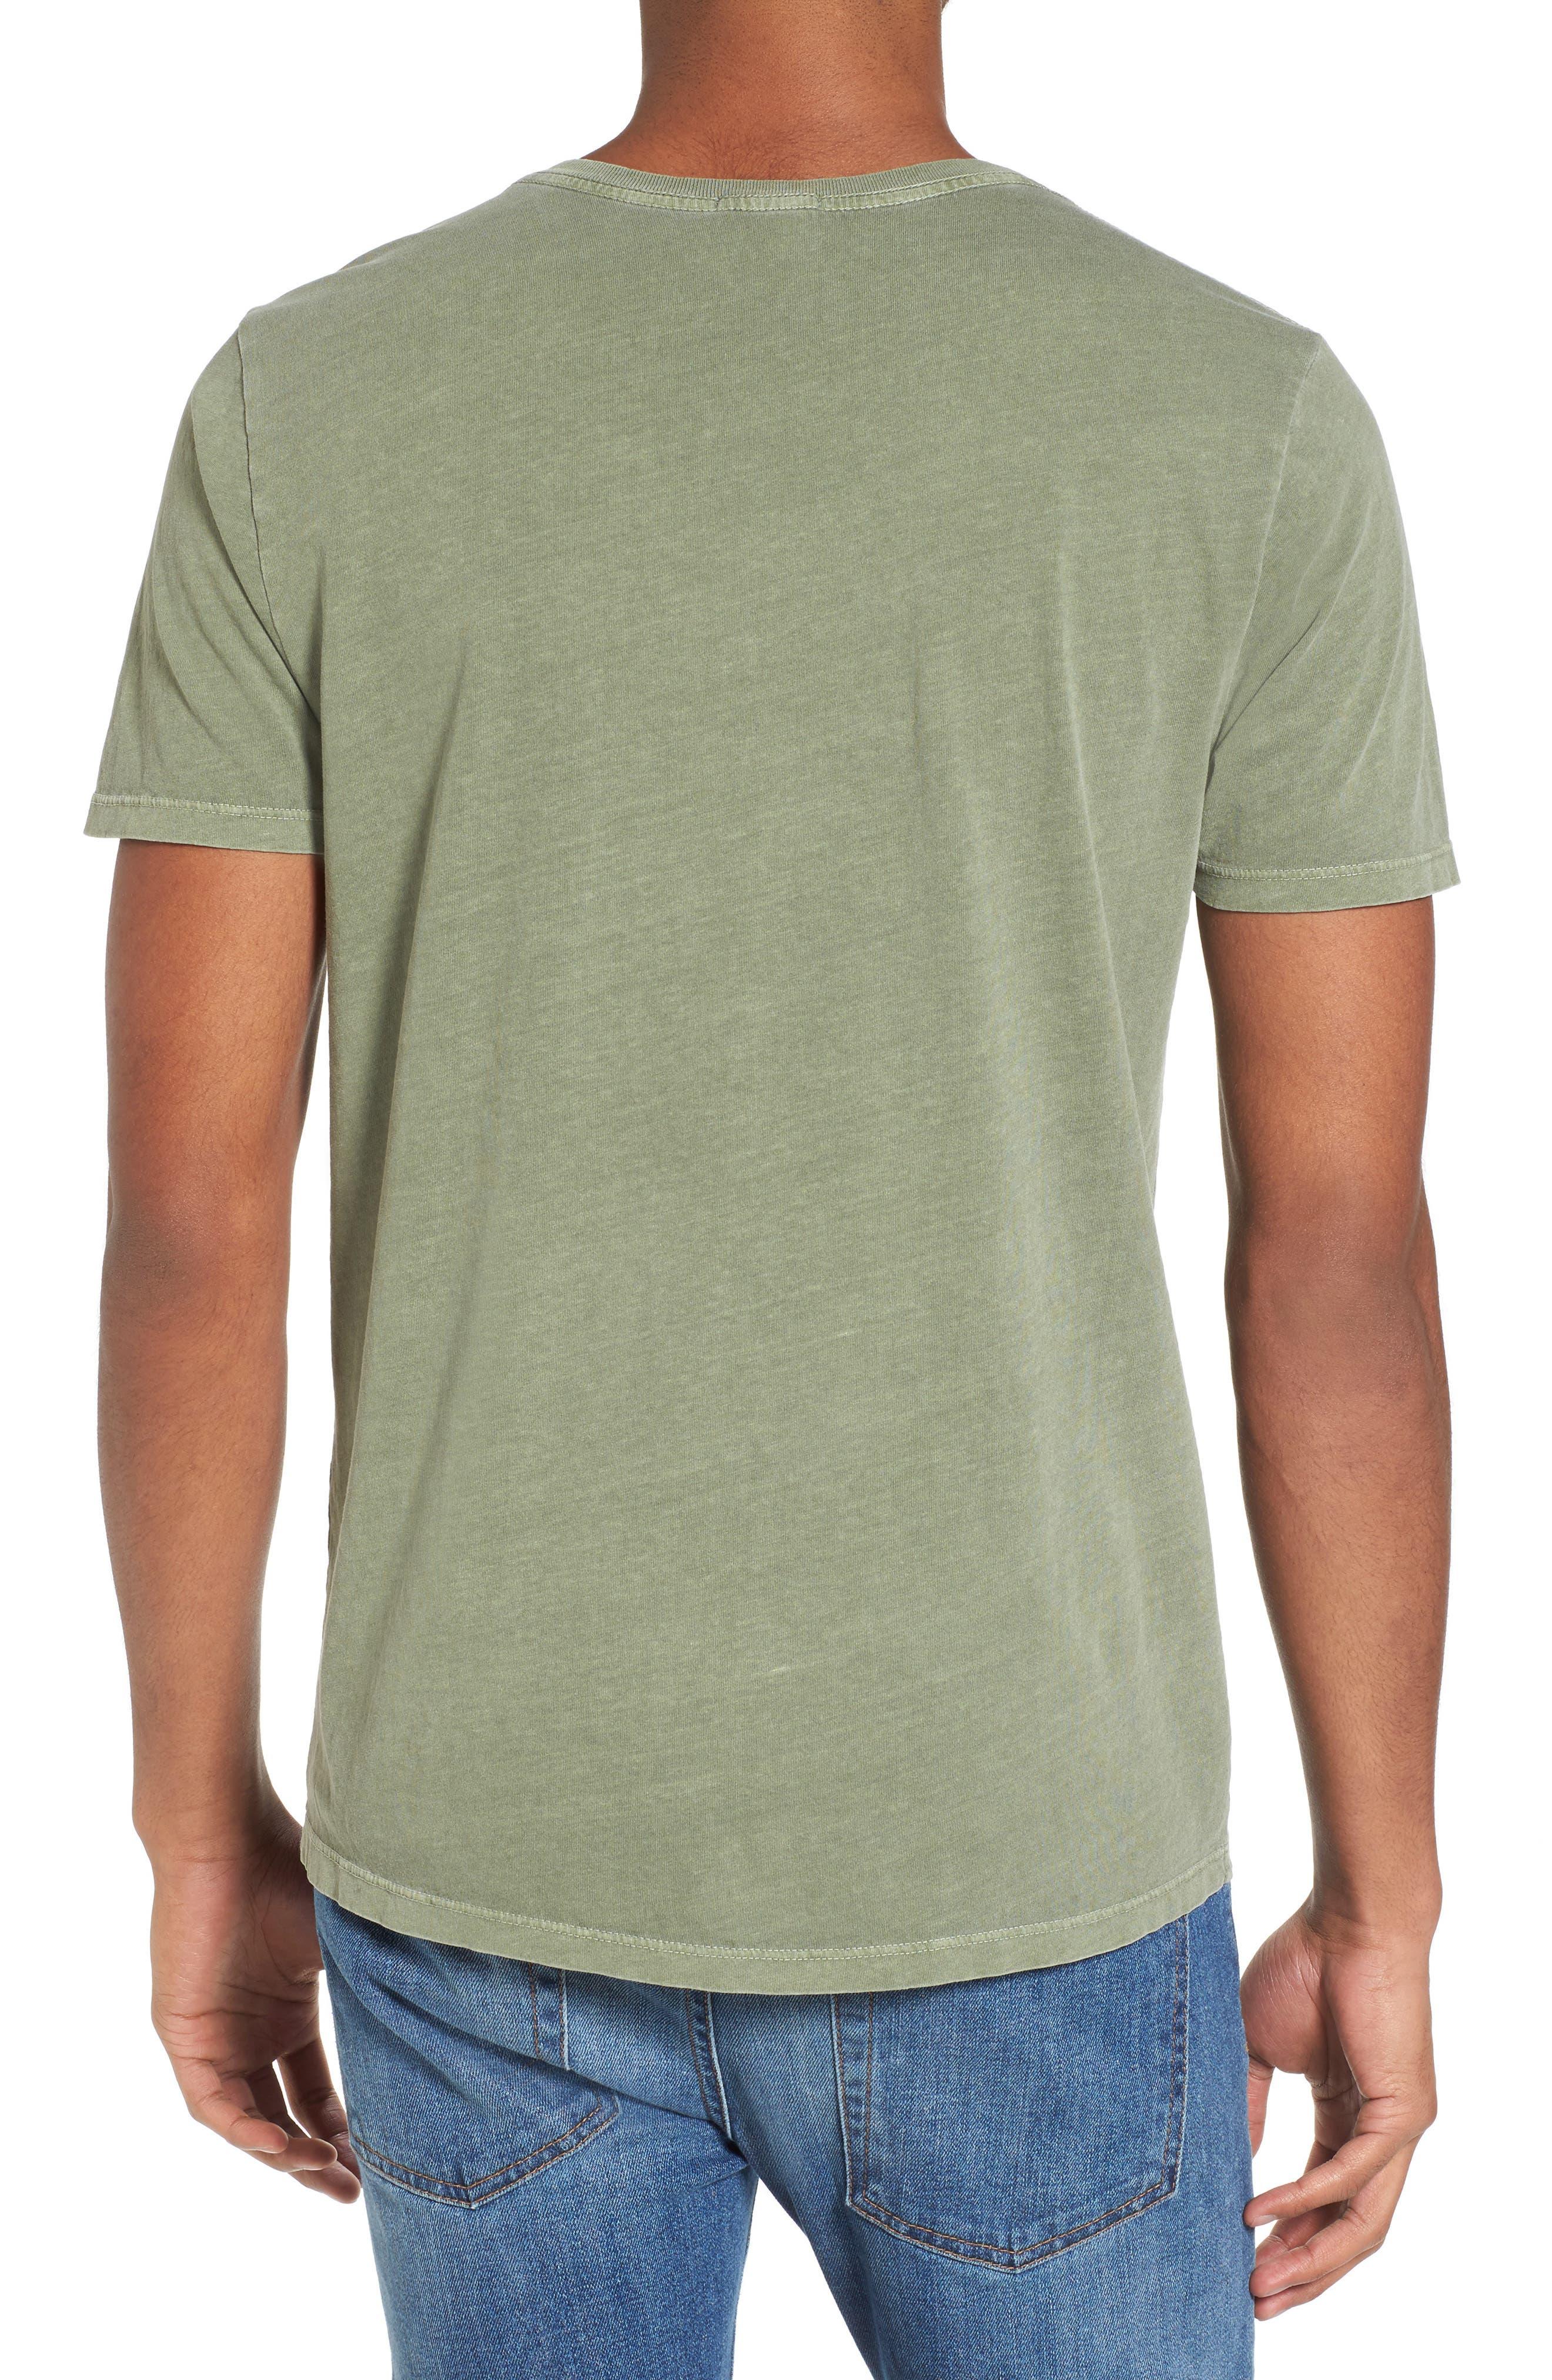 Fillmore Street Vintage Graphic T-Shirt,                             Alternate thumbnail 2, color,                             301